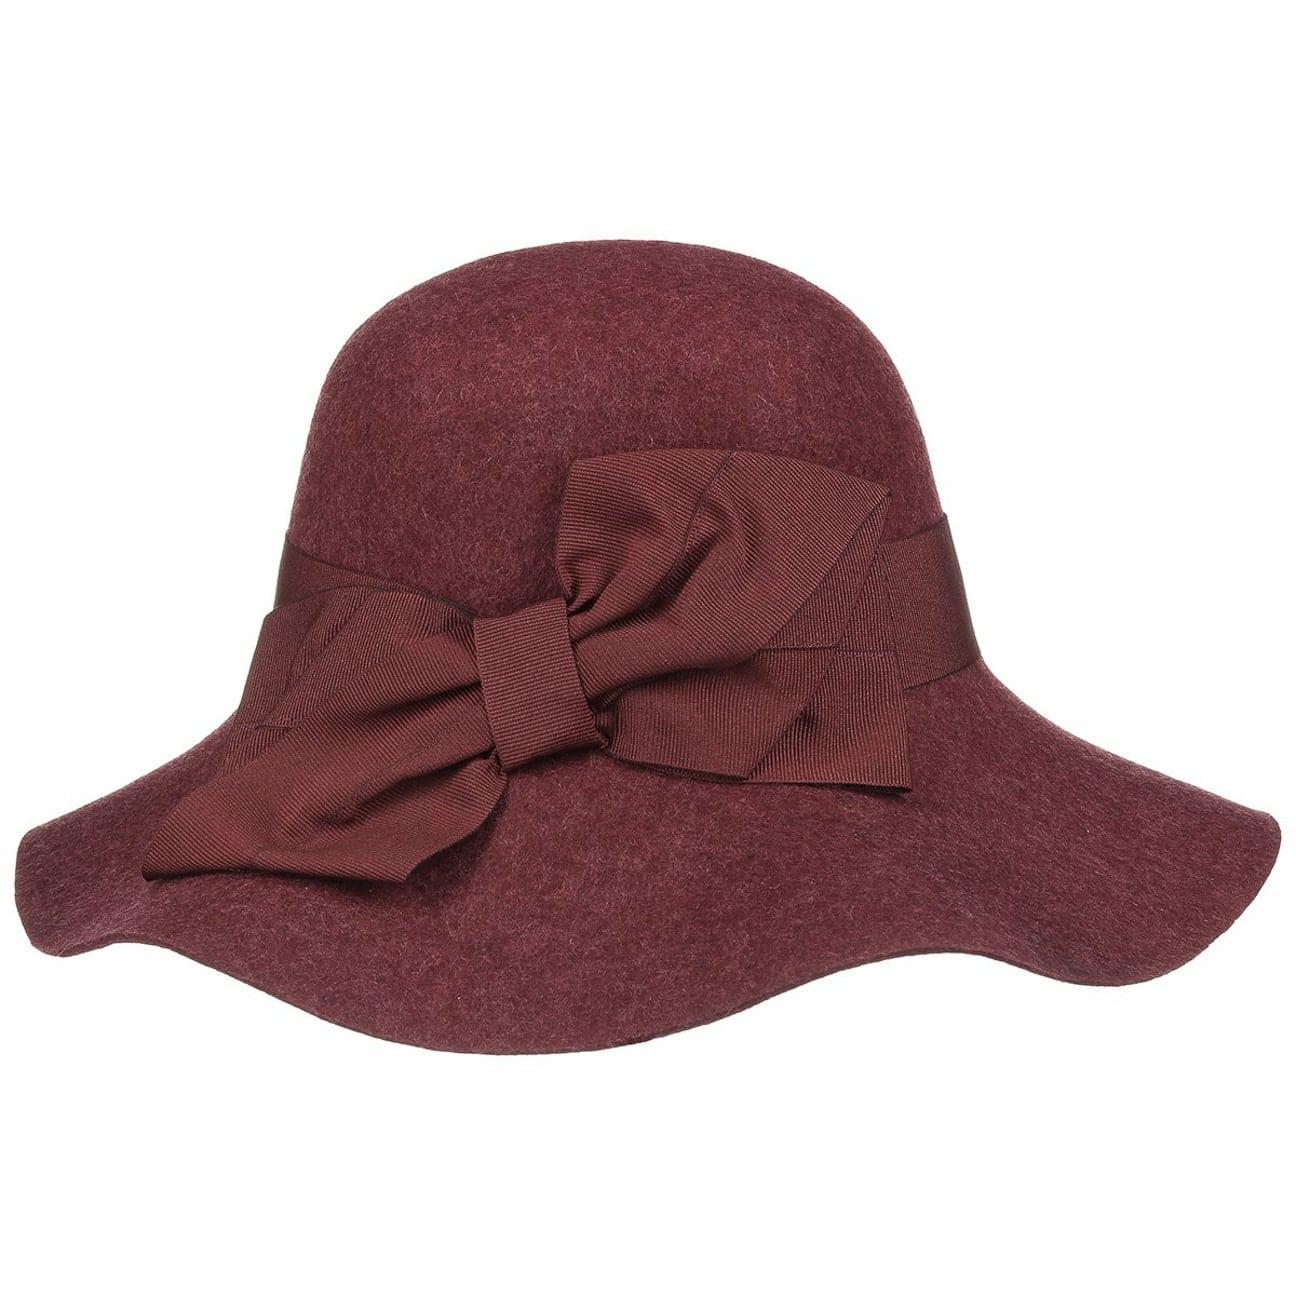 10c44d27e5986 ... Lussana Flapper Floppy Hat by bedacht - purple 4 ...